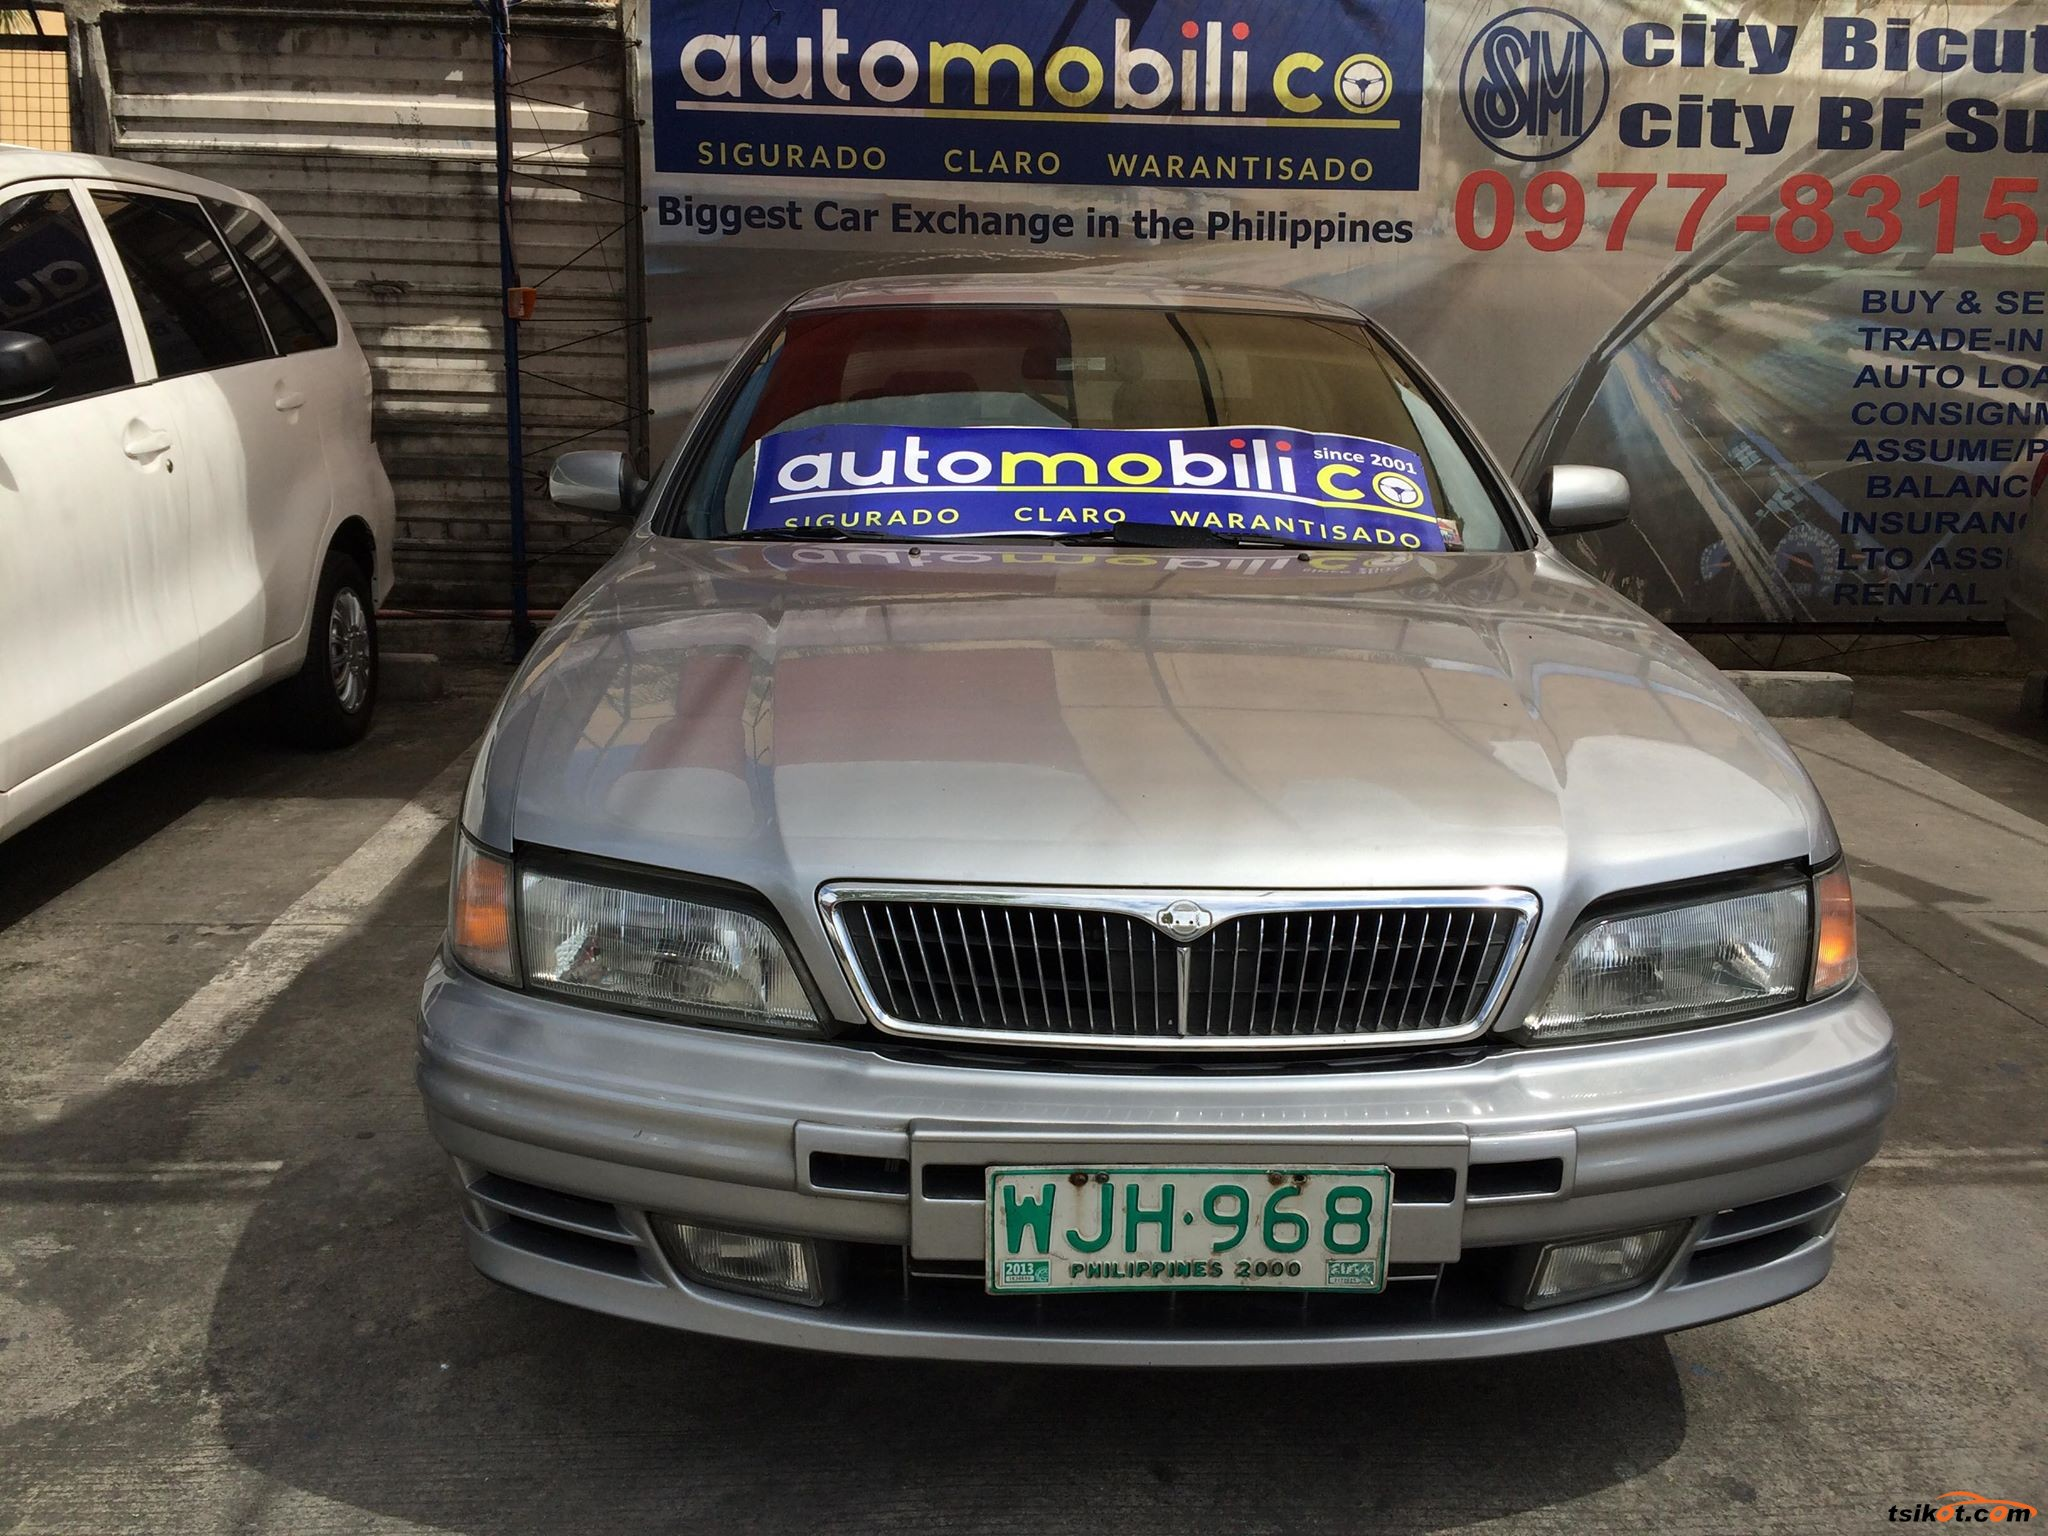 ec75aa46e8 Nissan Cefiro 2001 - Car for Sale Metro Manila